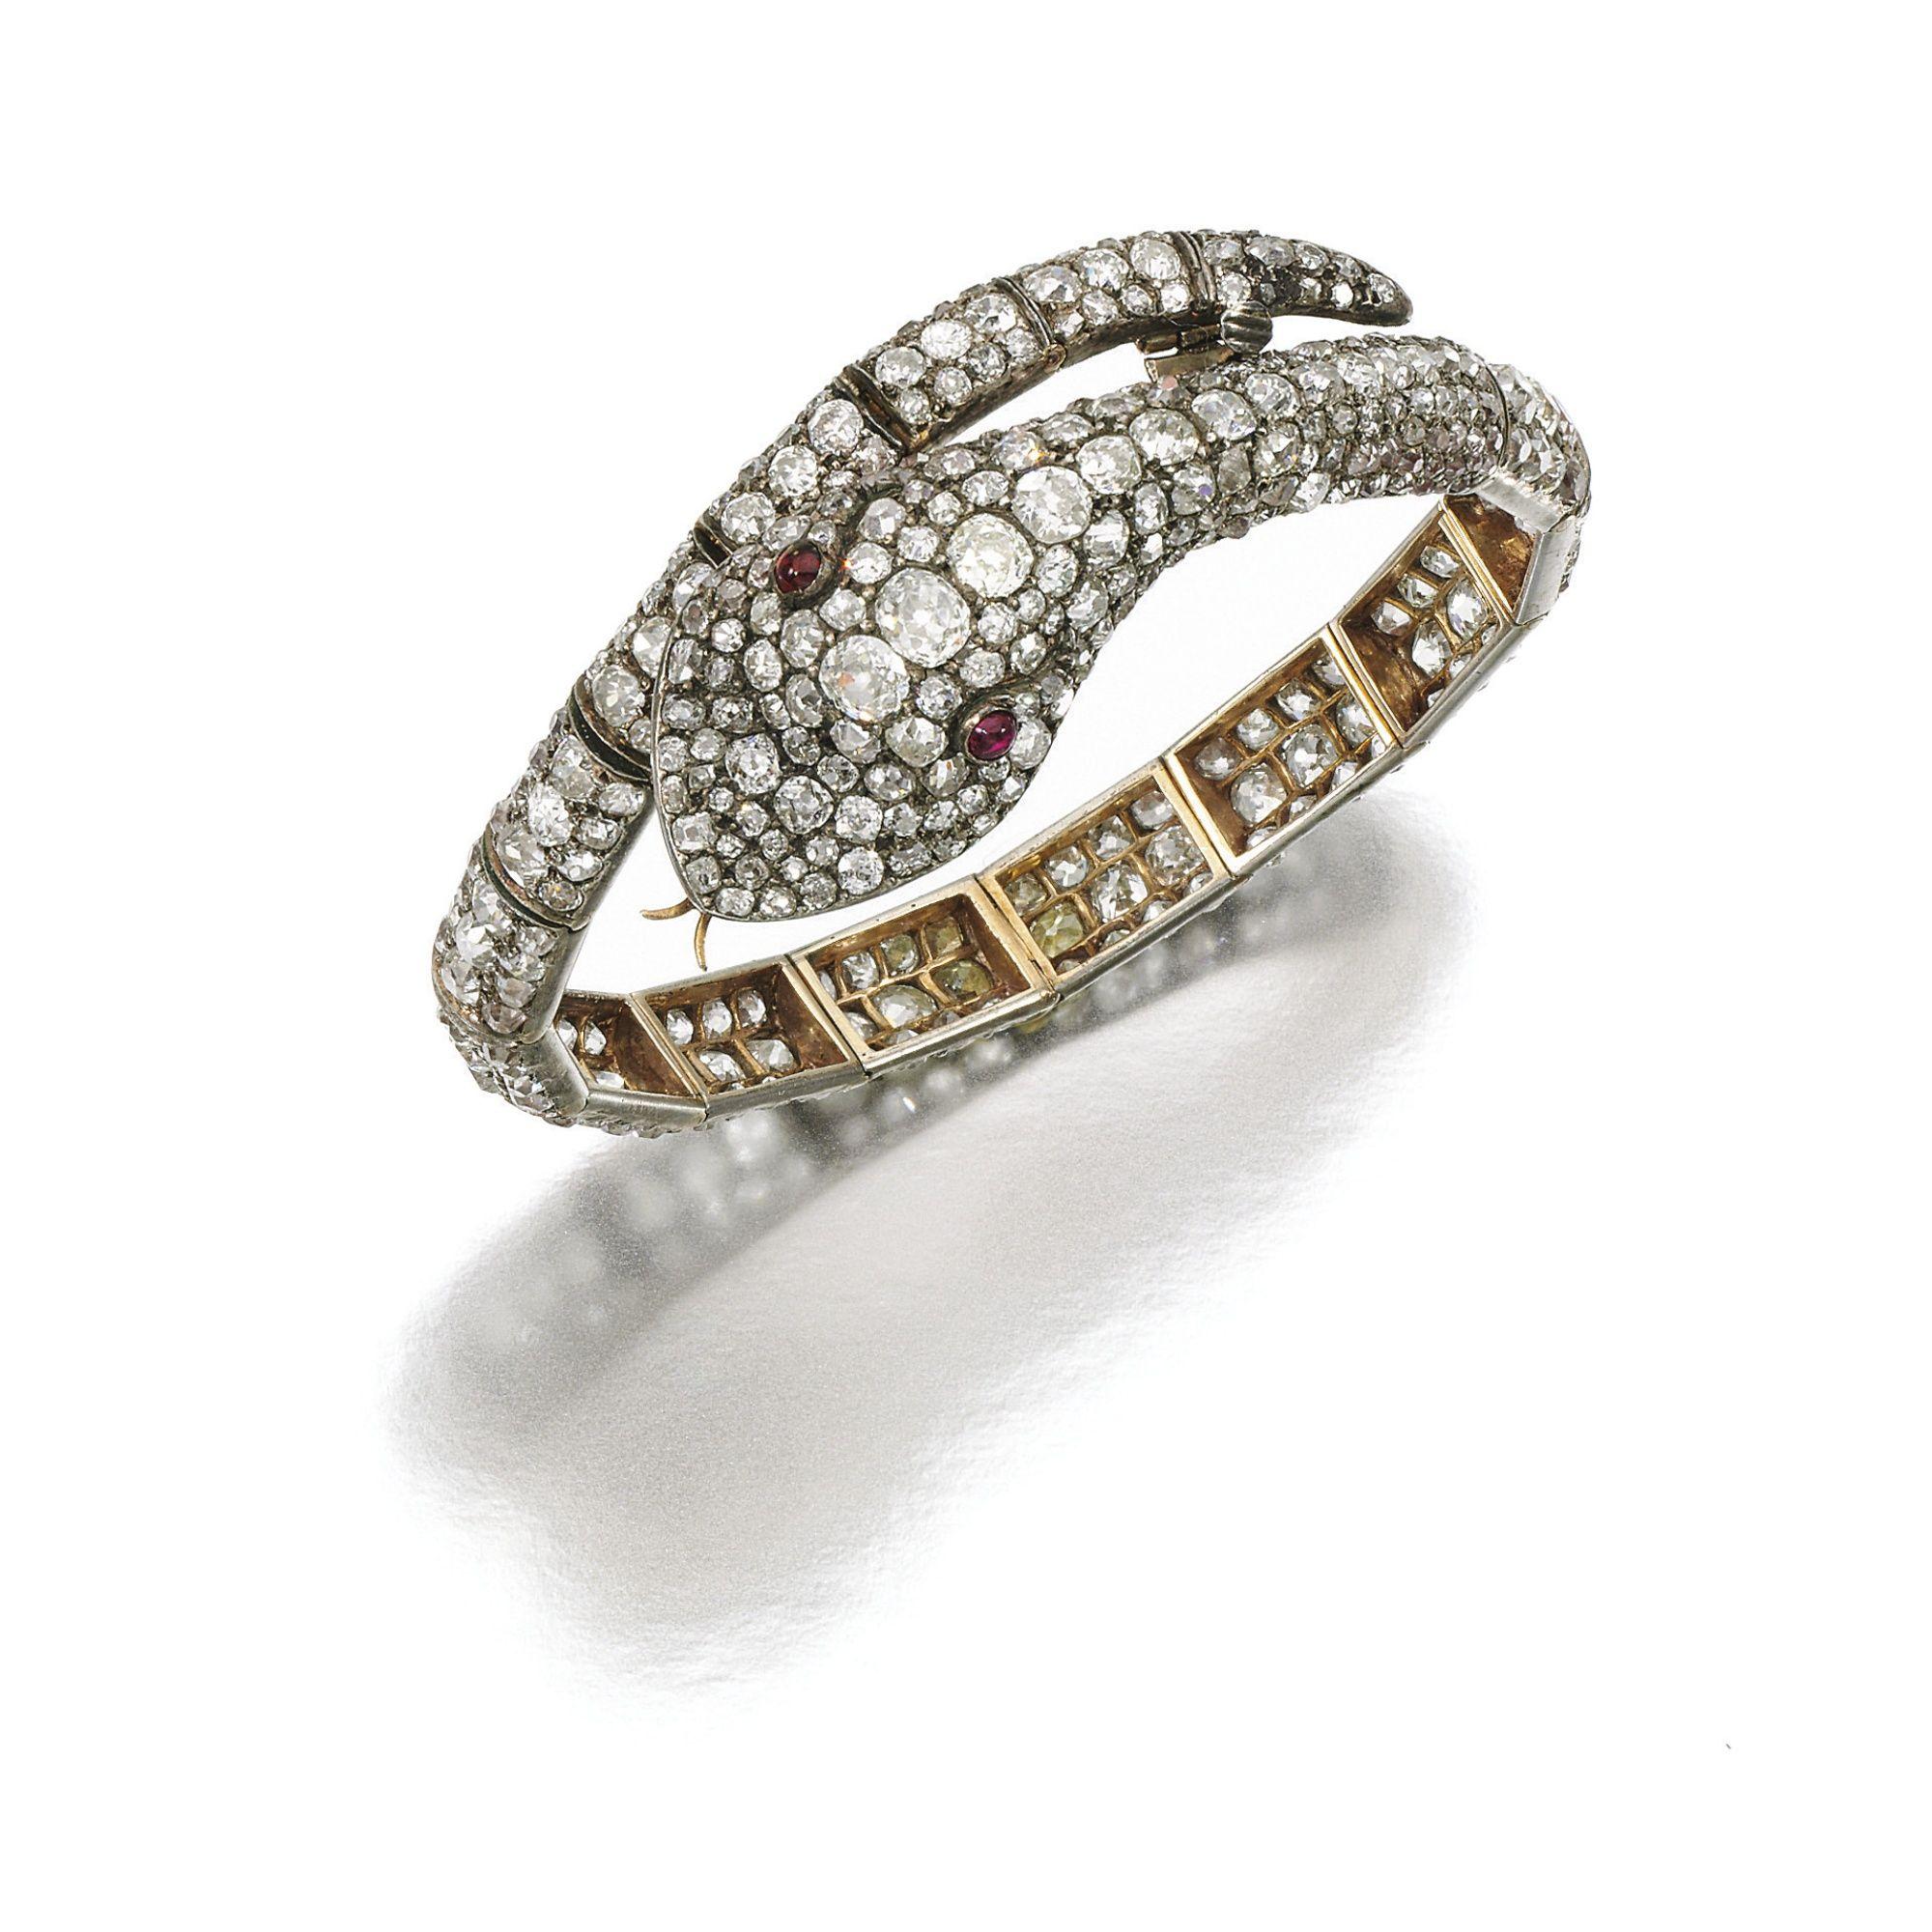 Ruby and diamond bracelet late th century designed as a snake